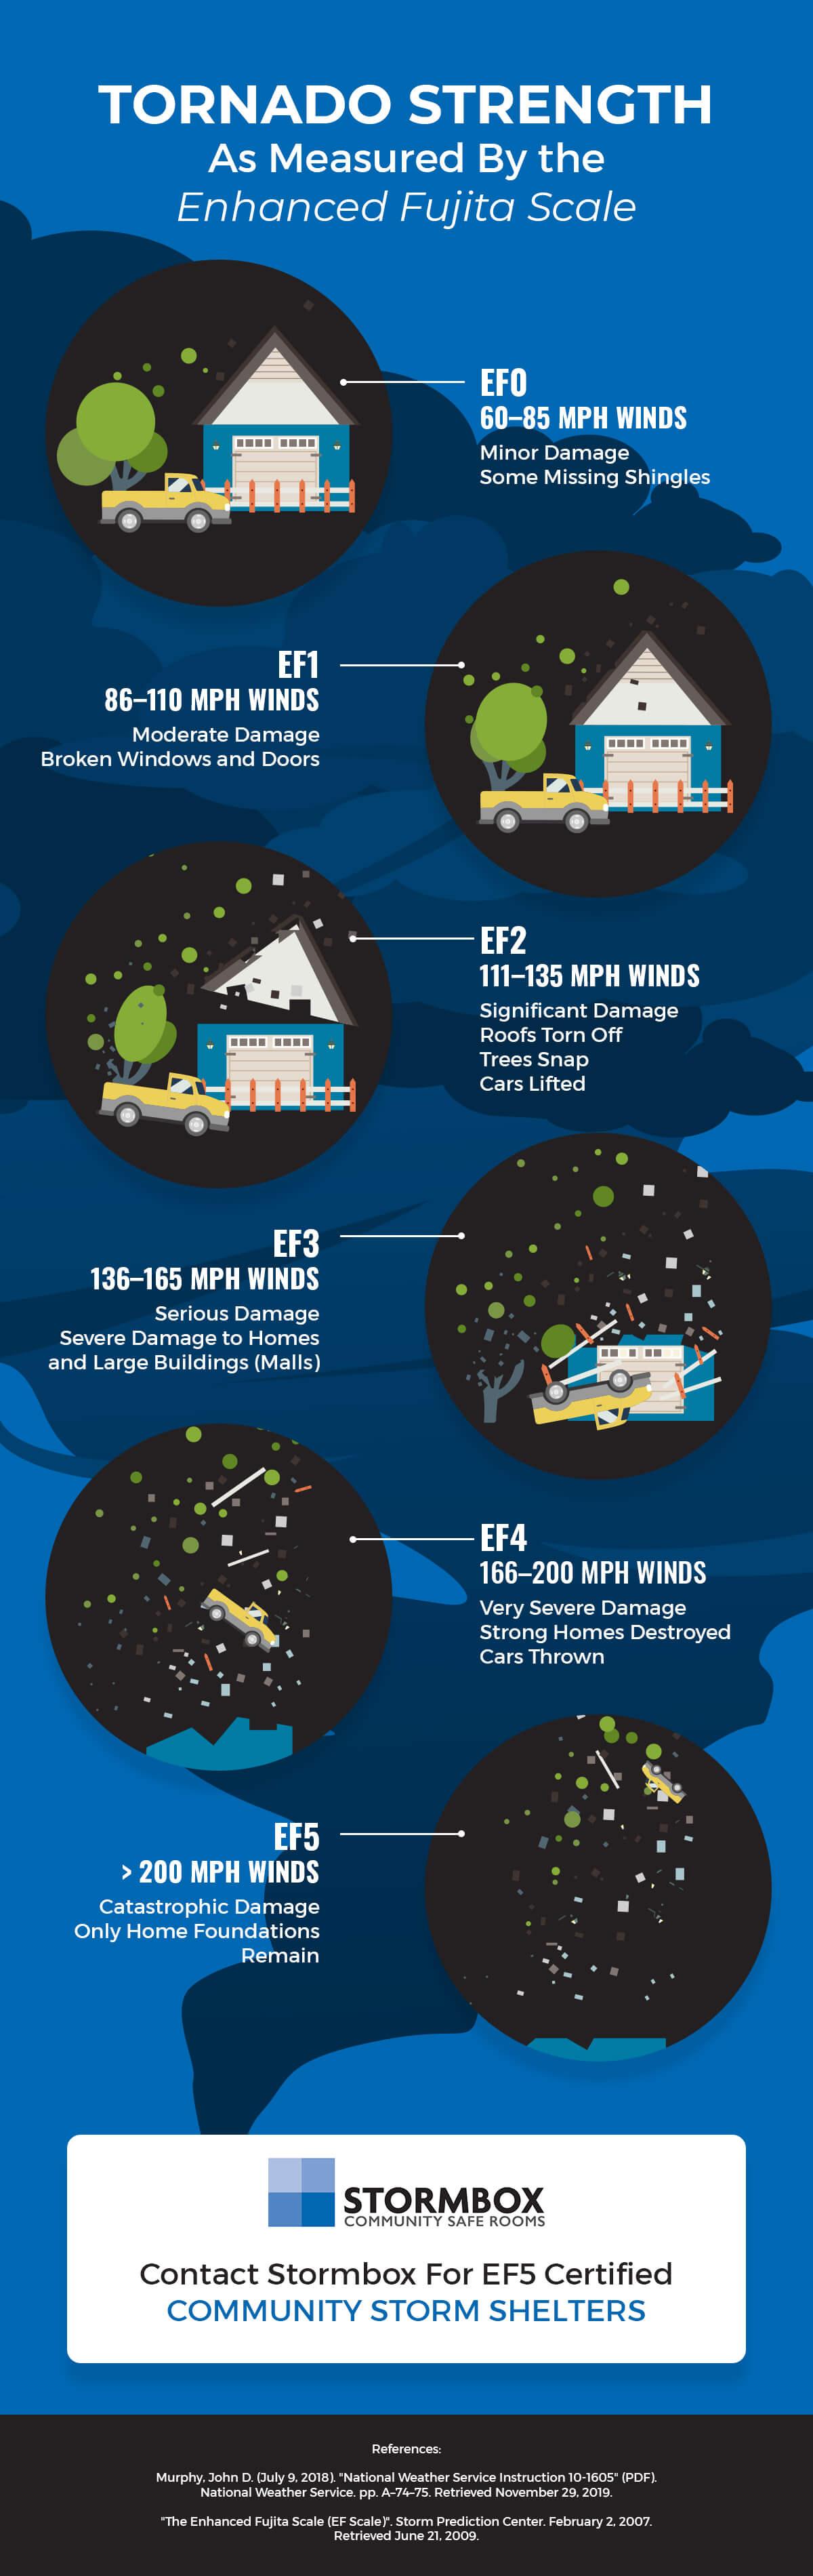 Tornado Strengths As Measured By the Enhanced Fujita Scale